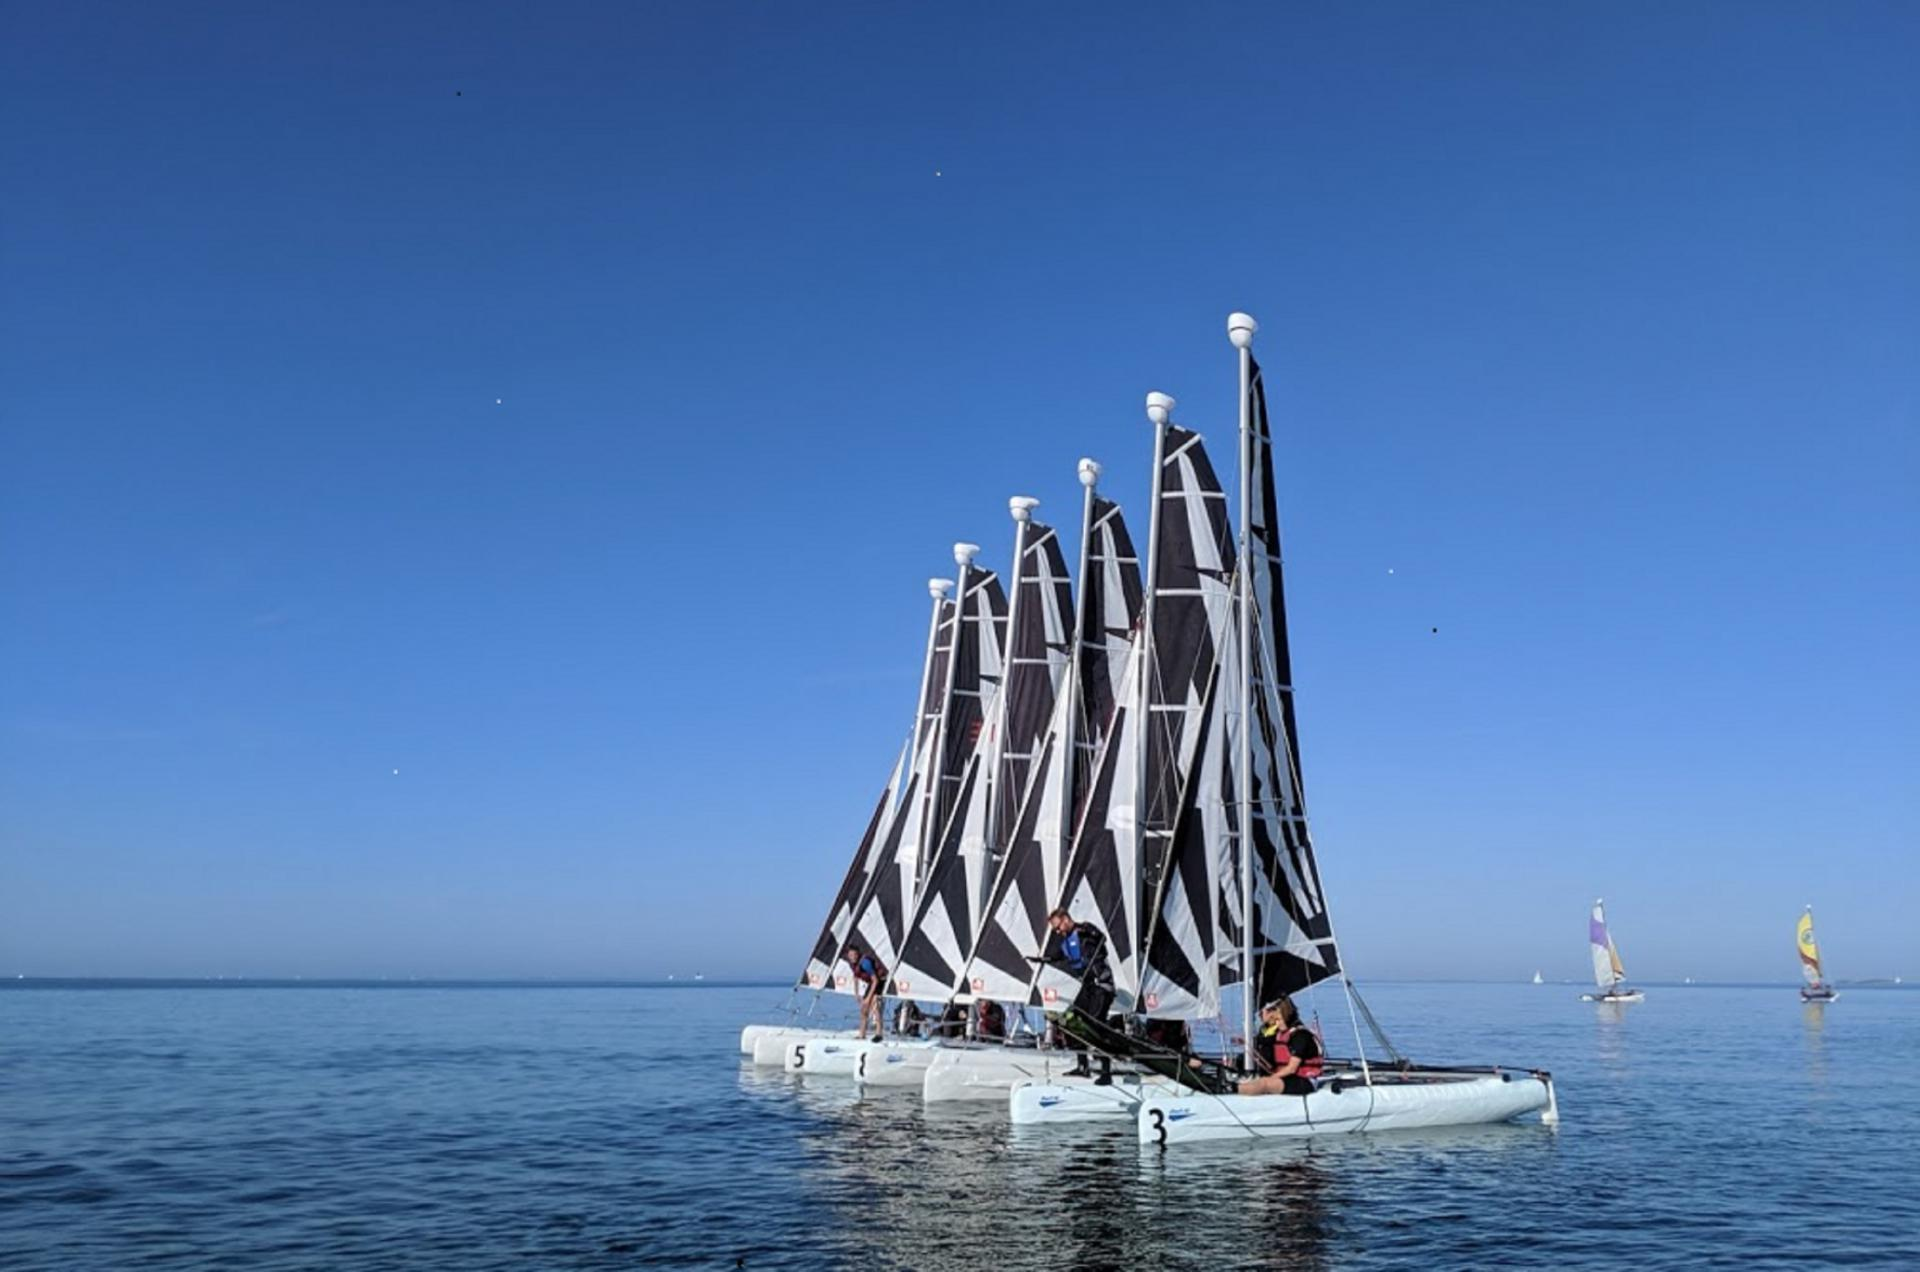 Sortie ressourçante en catamaran, Dart 16 entre collègues au Club Nautique du Rohu, Morbihan, Bretagne